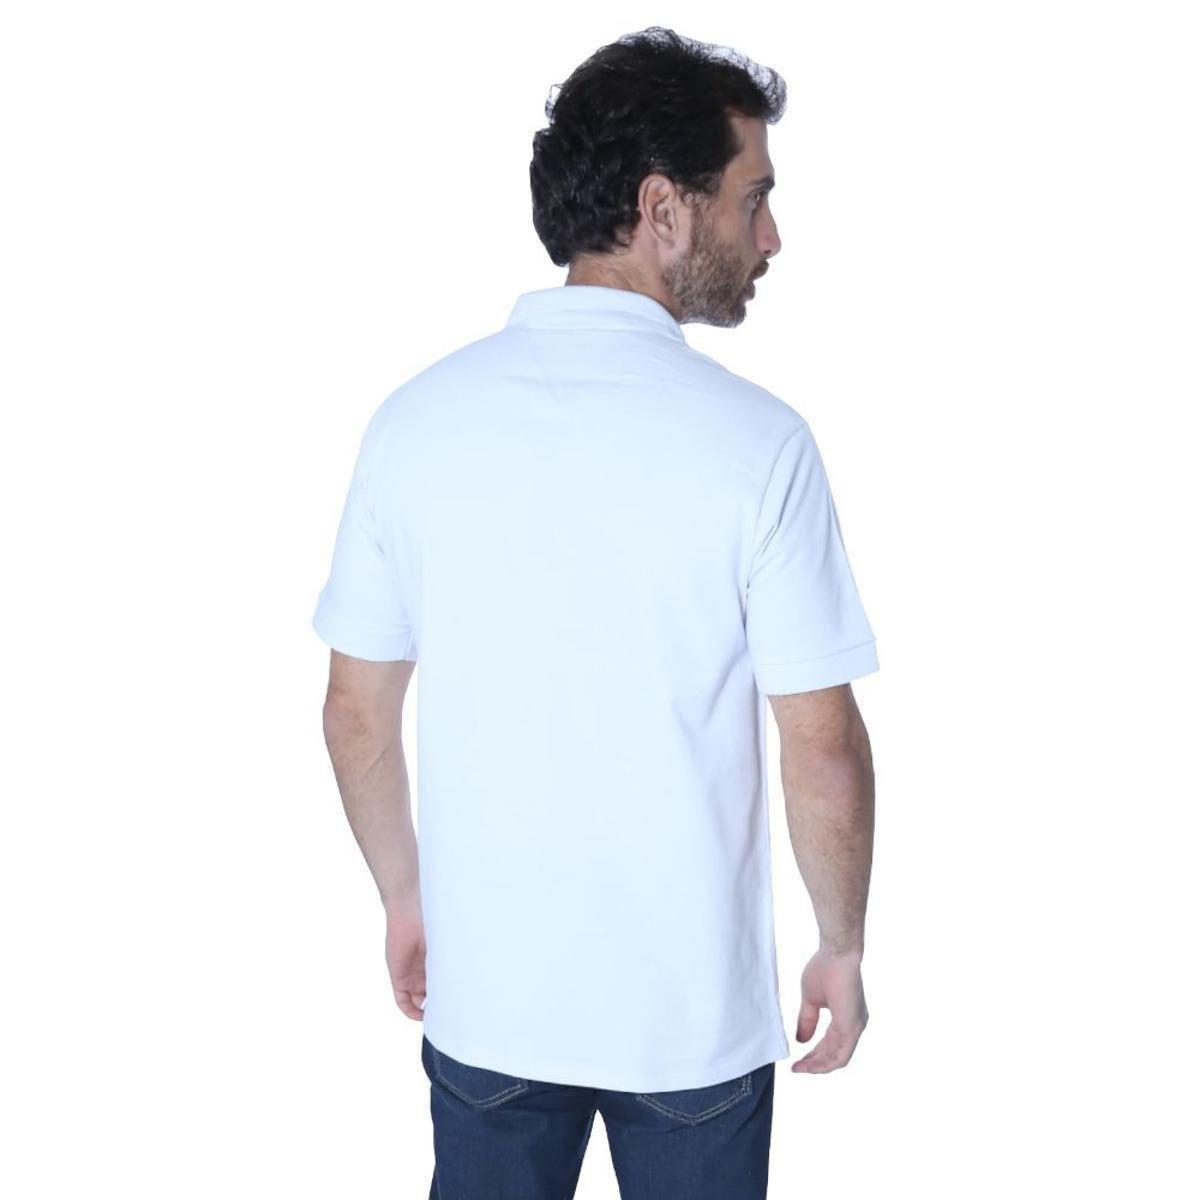 Camisa Polo Hipica Polo Club Player Classic Masculina - Branco